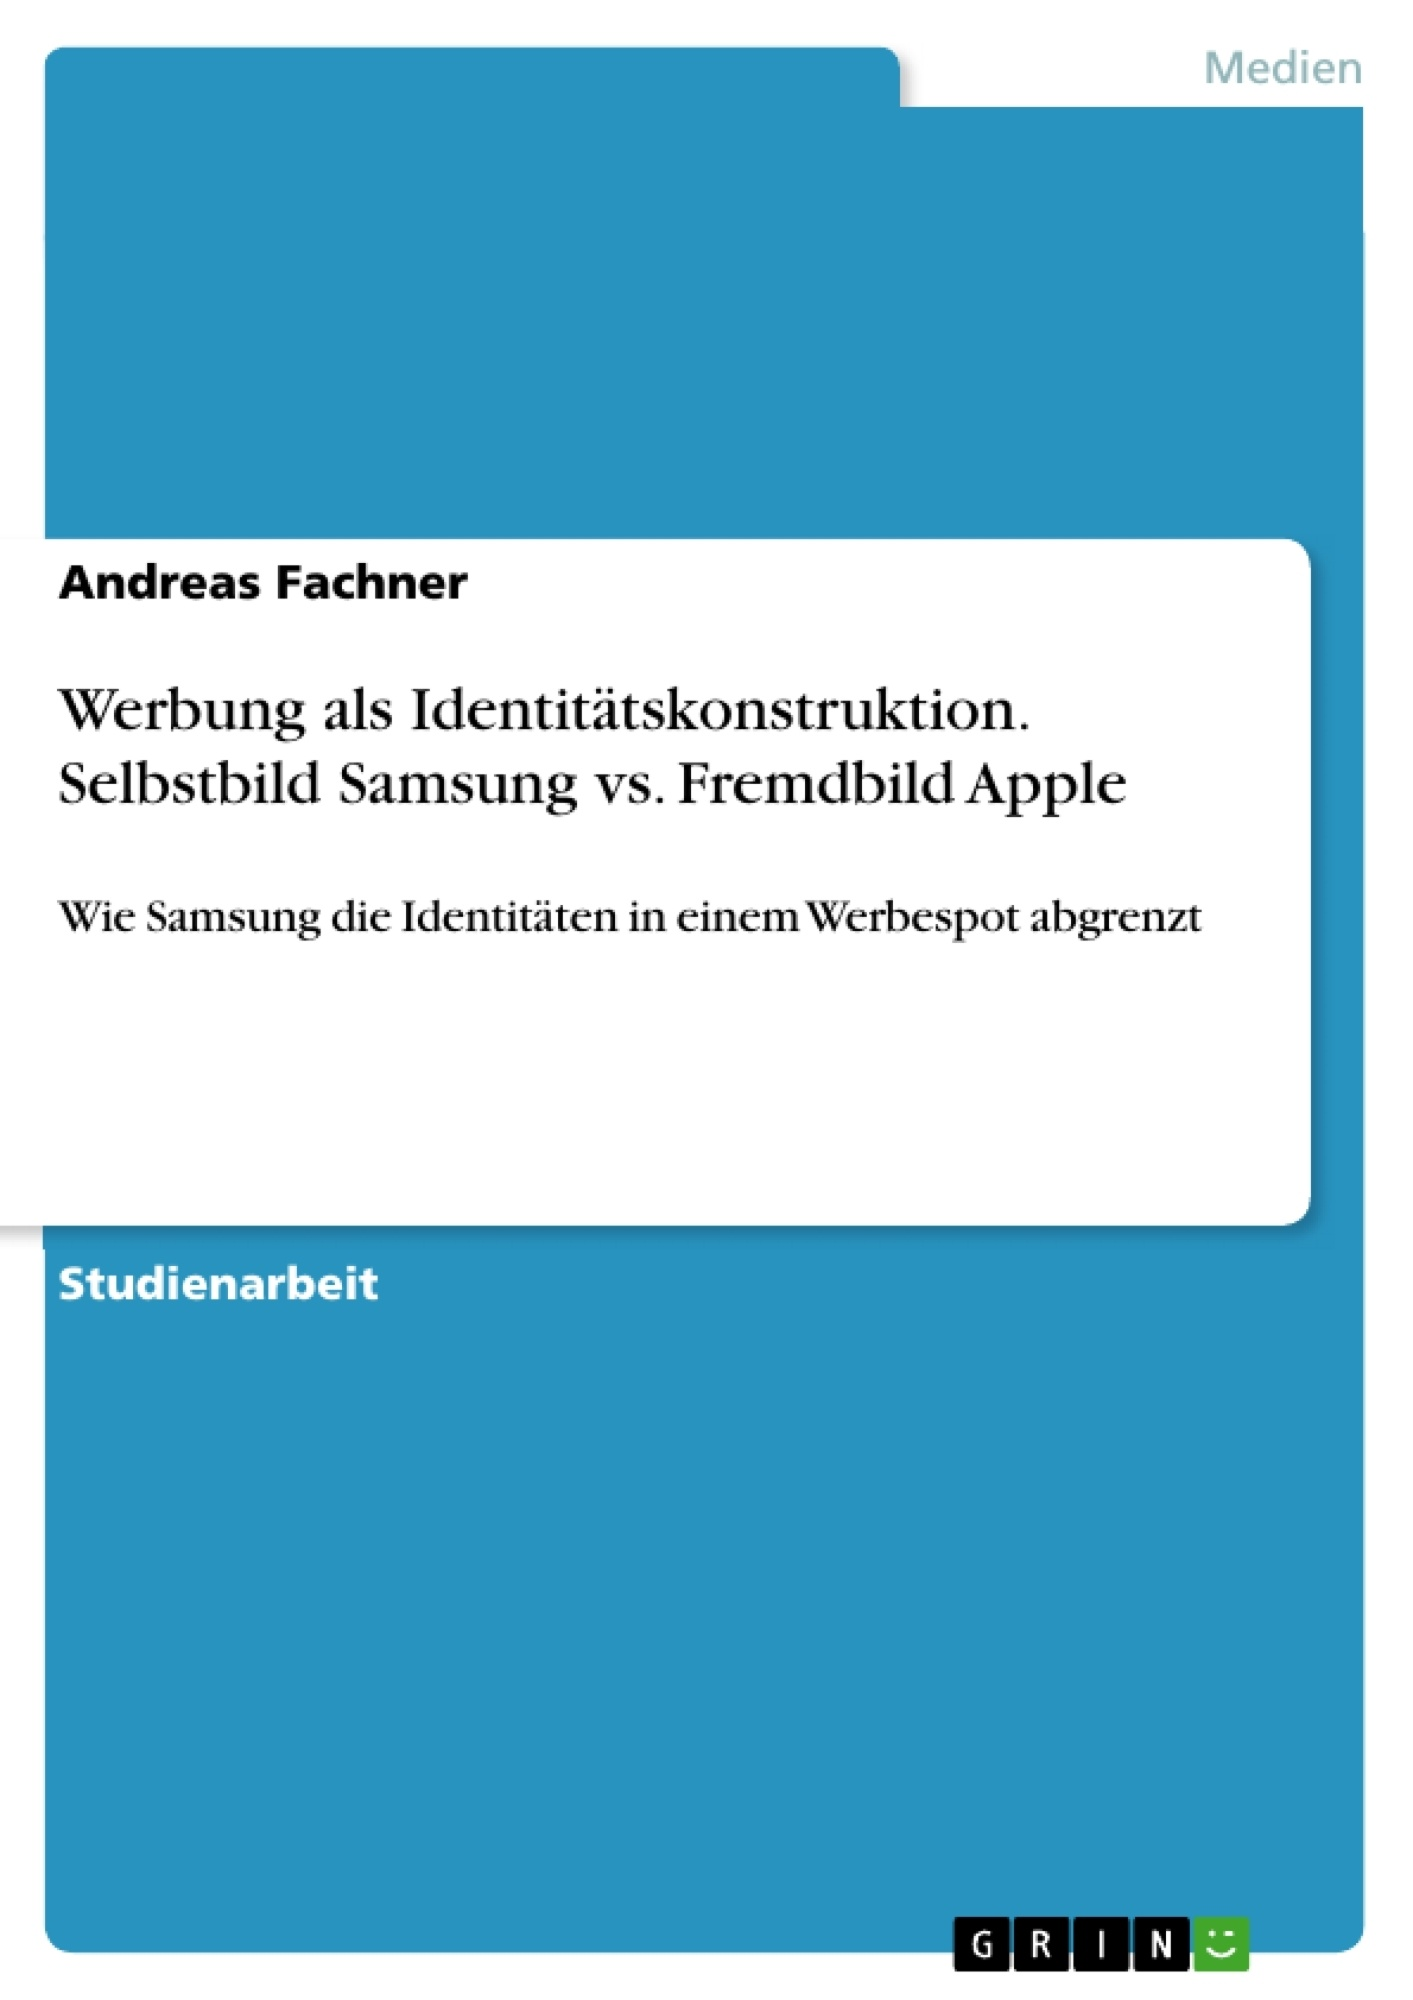 Titel: Werbung als Identitätskonstruktion. Selbstbild Samsung vs. Fremdbild Apple